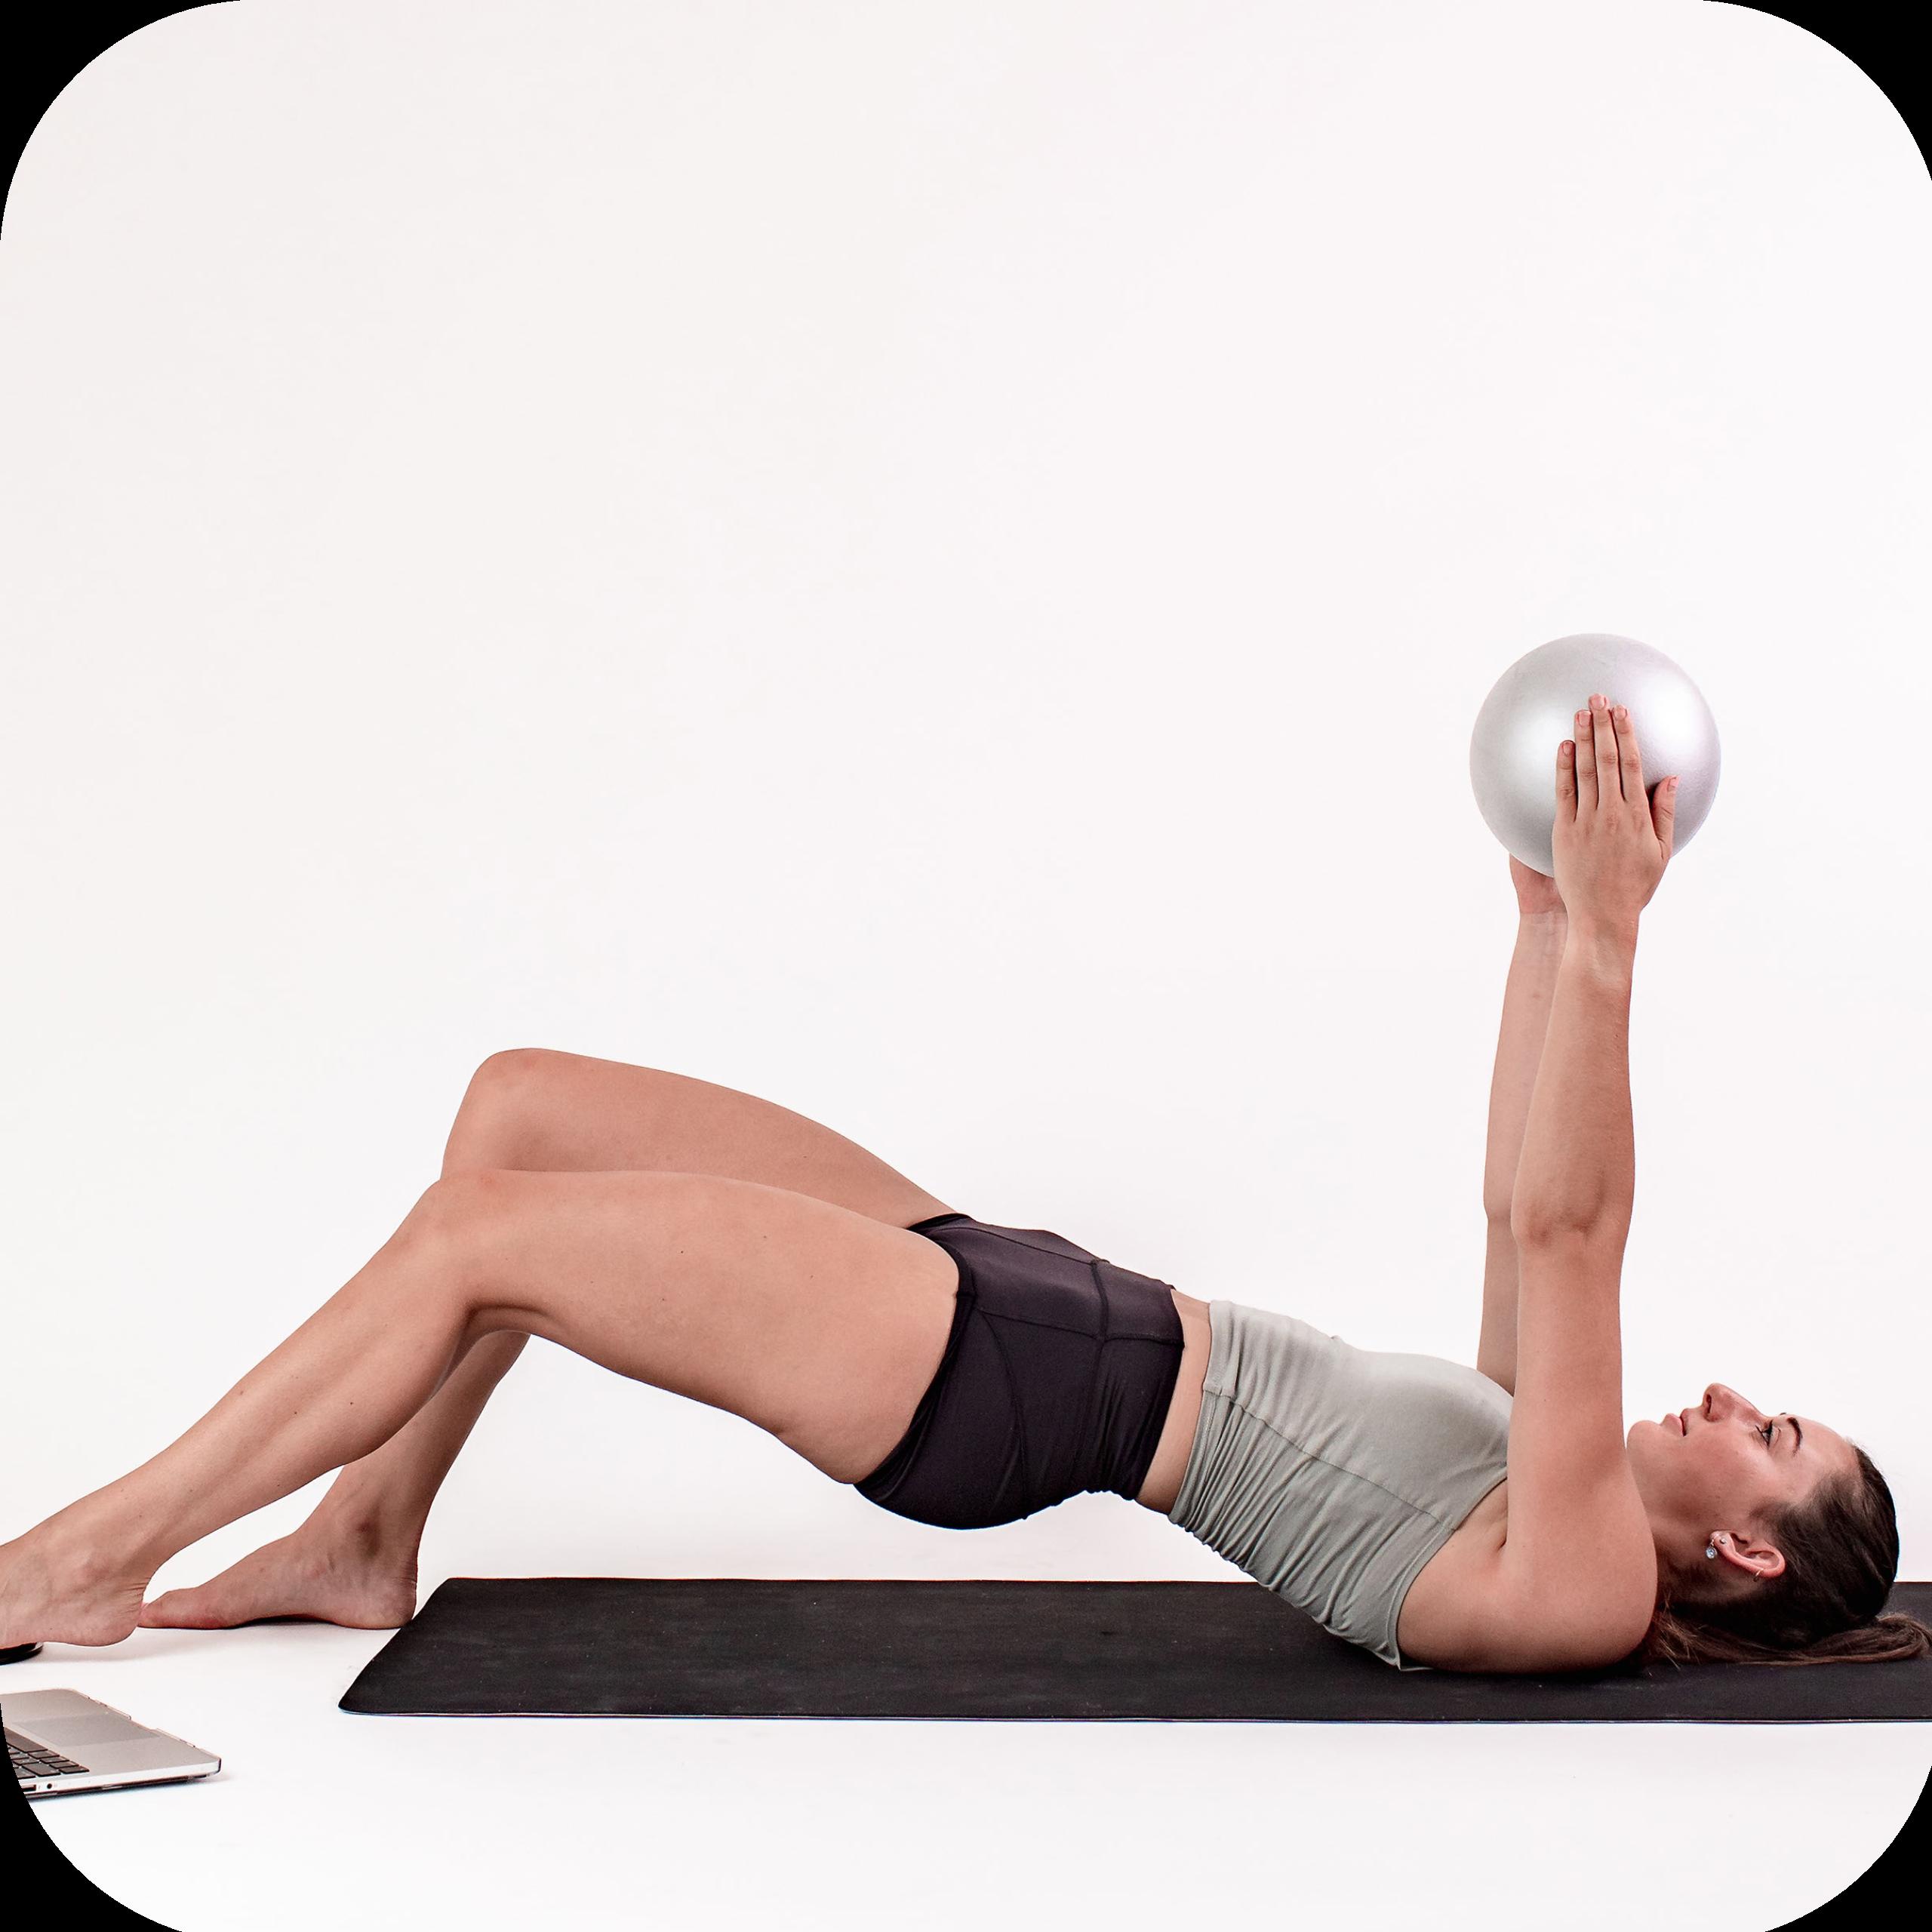 Online Yoga Pilates Barre | Her. Womens Health